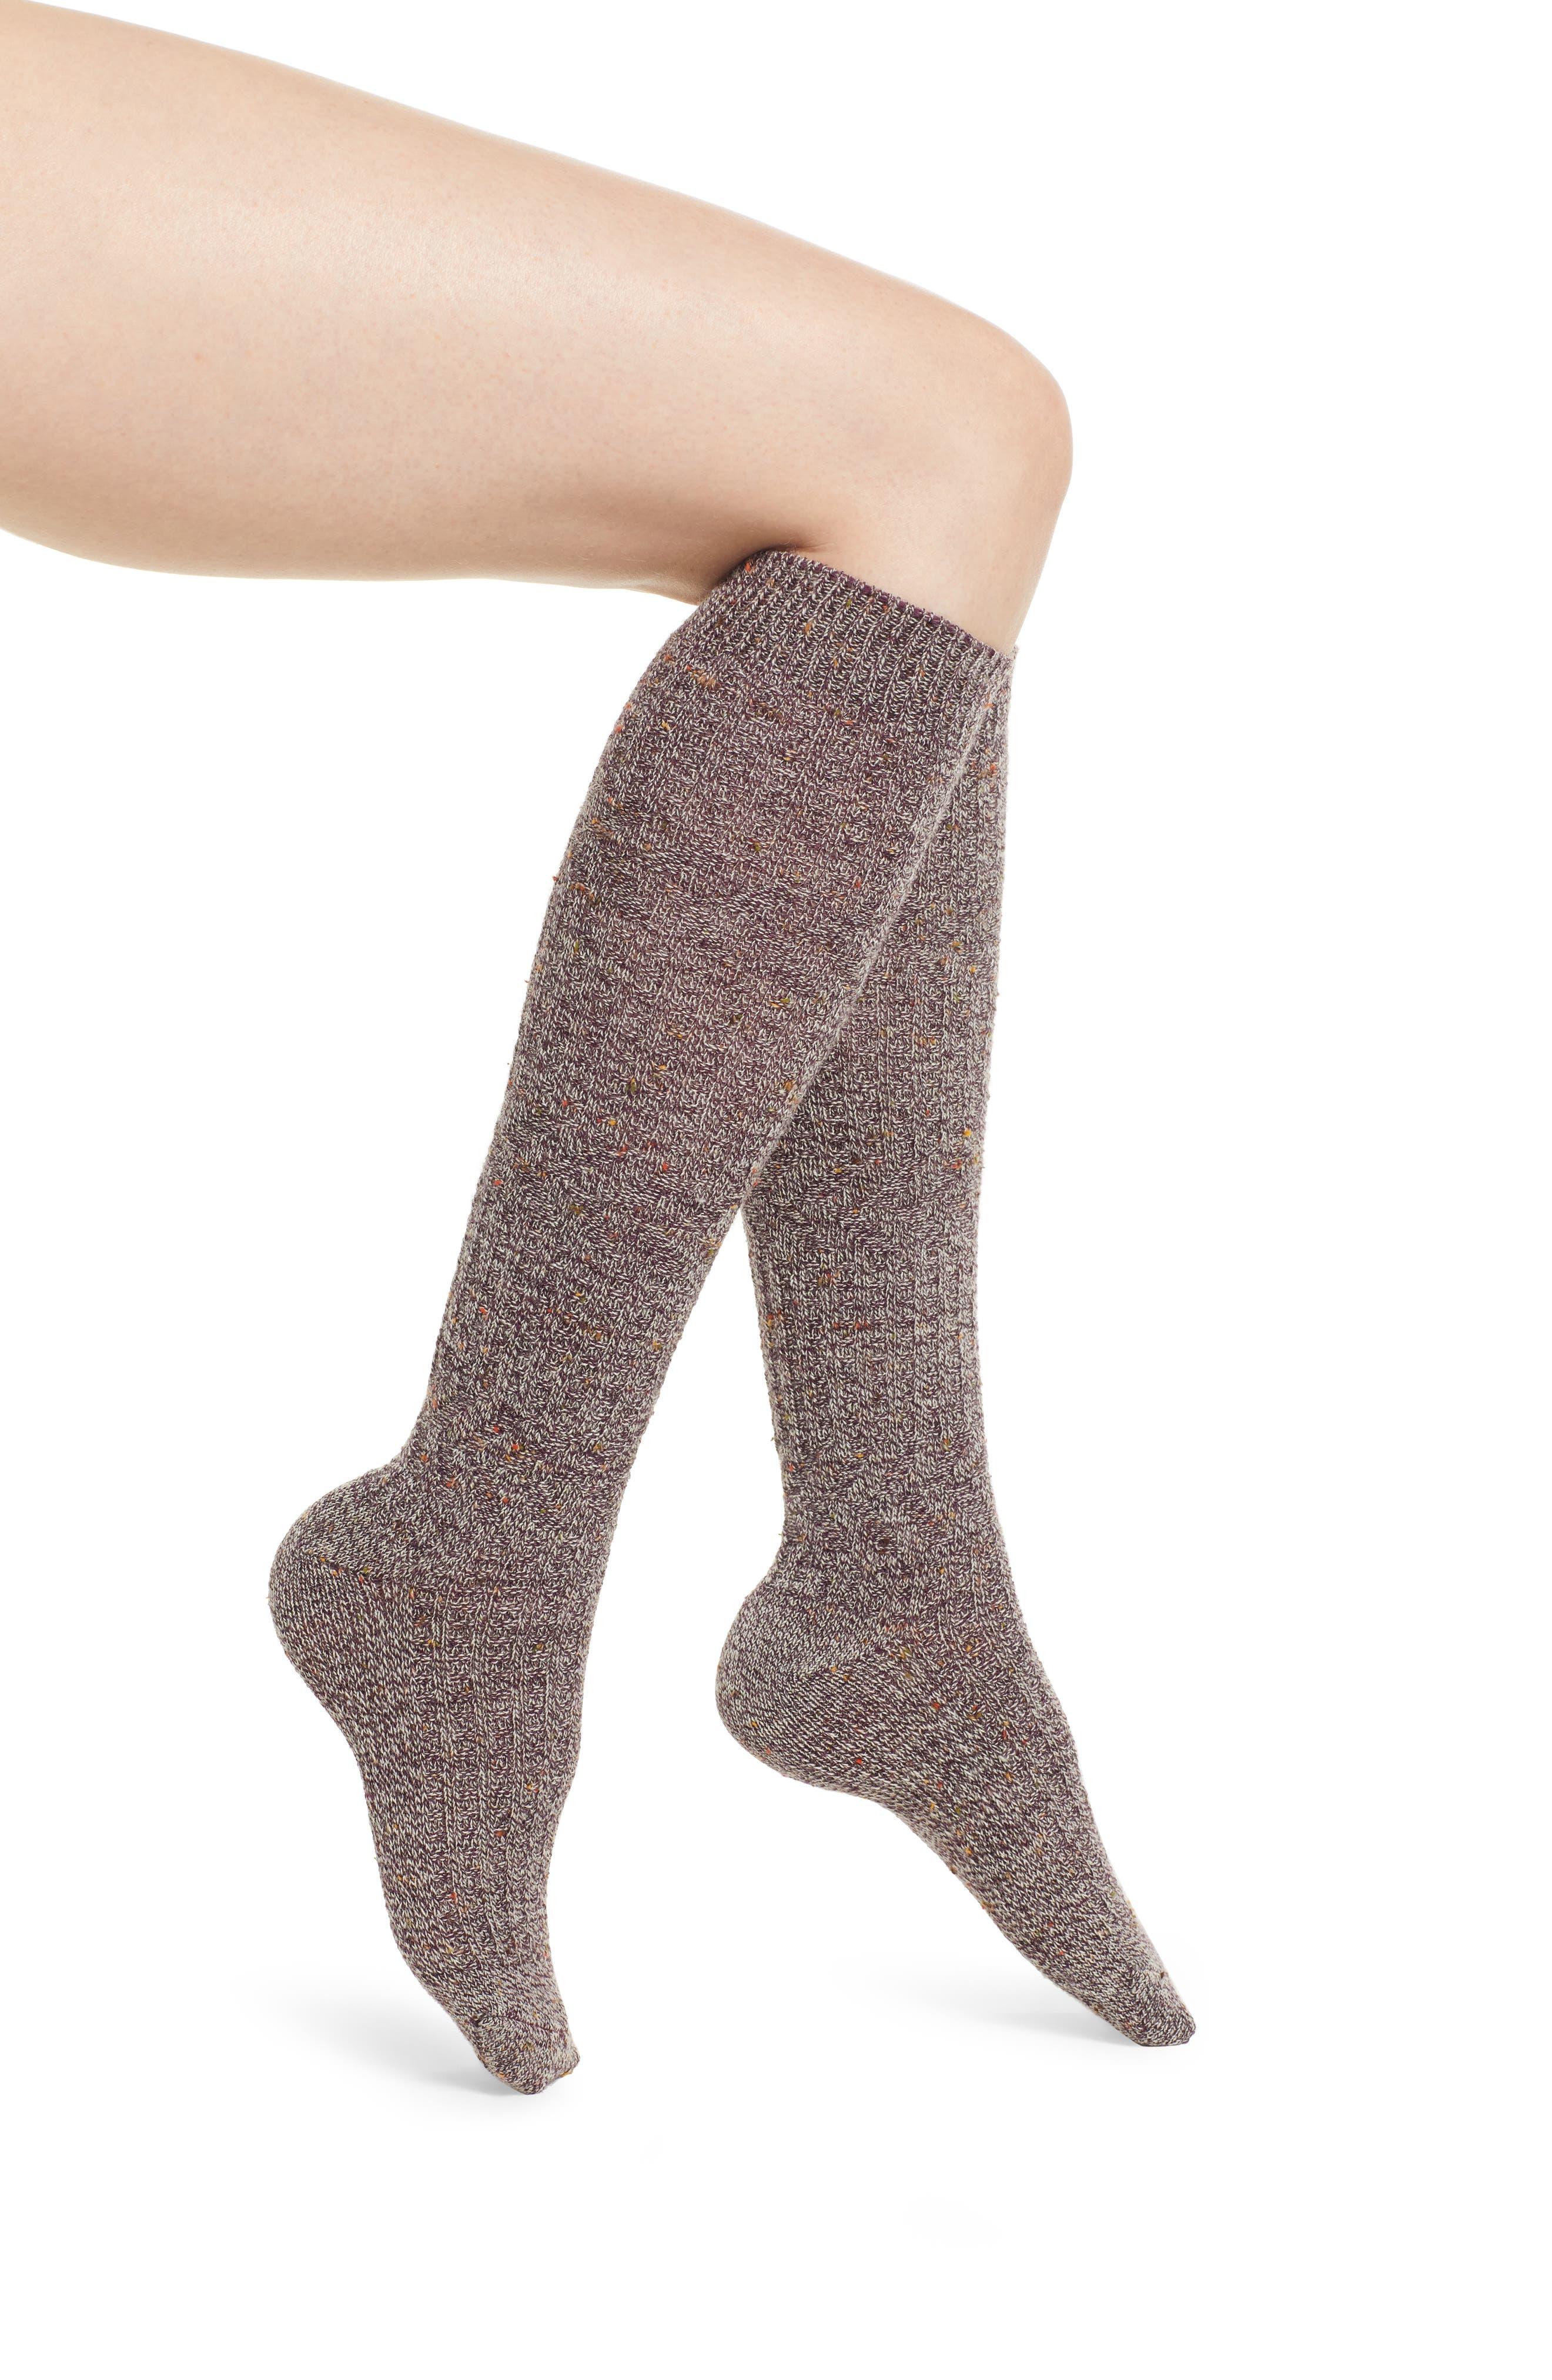 Image of SmartWool Wheat Fields Wool Blend Knee-High Socks